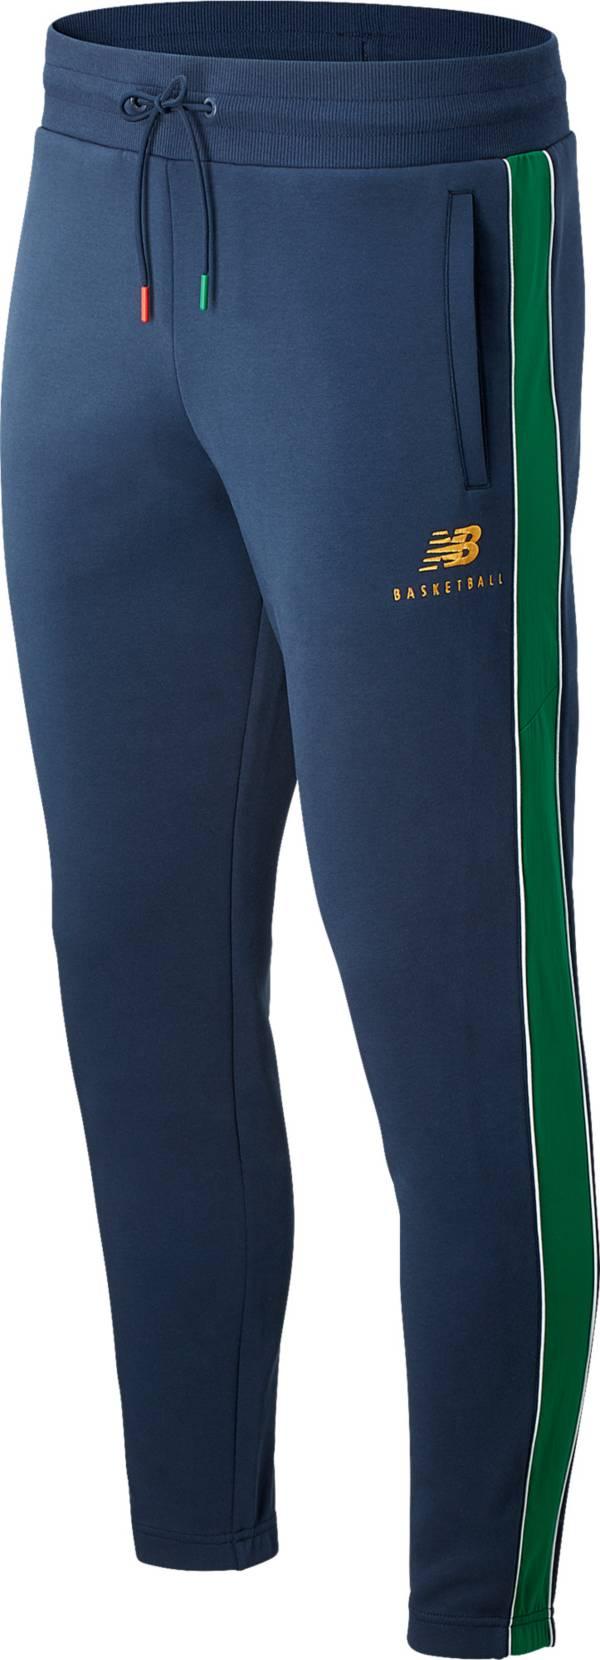 New Balance Men's Basketball Brand Pants product image